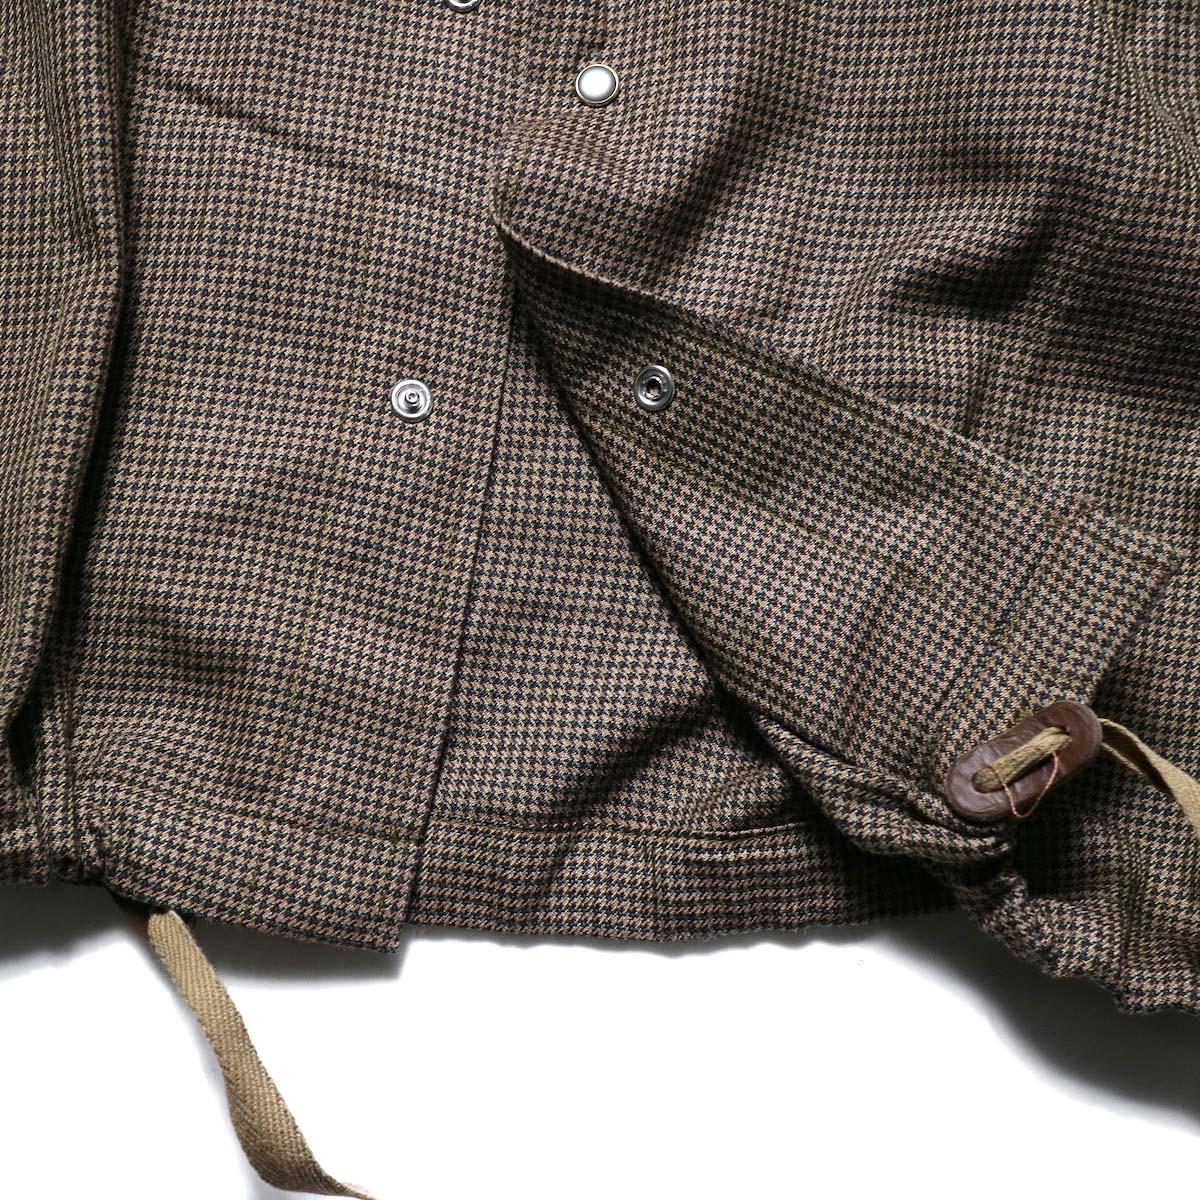 AiE / Coach Shirt -Wool Check (Brown)ボタン、ドローコード